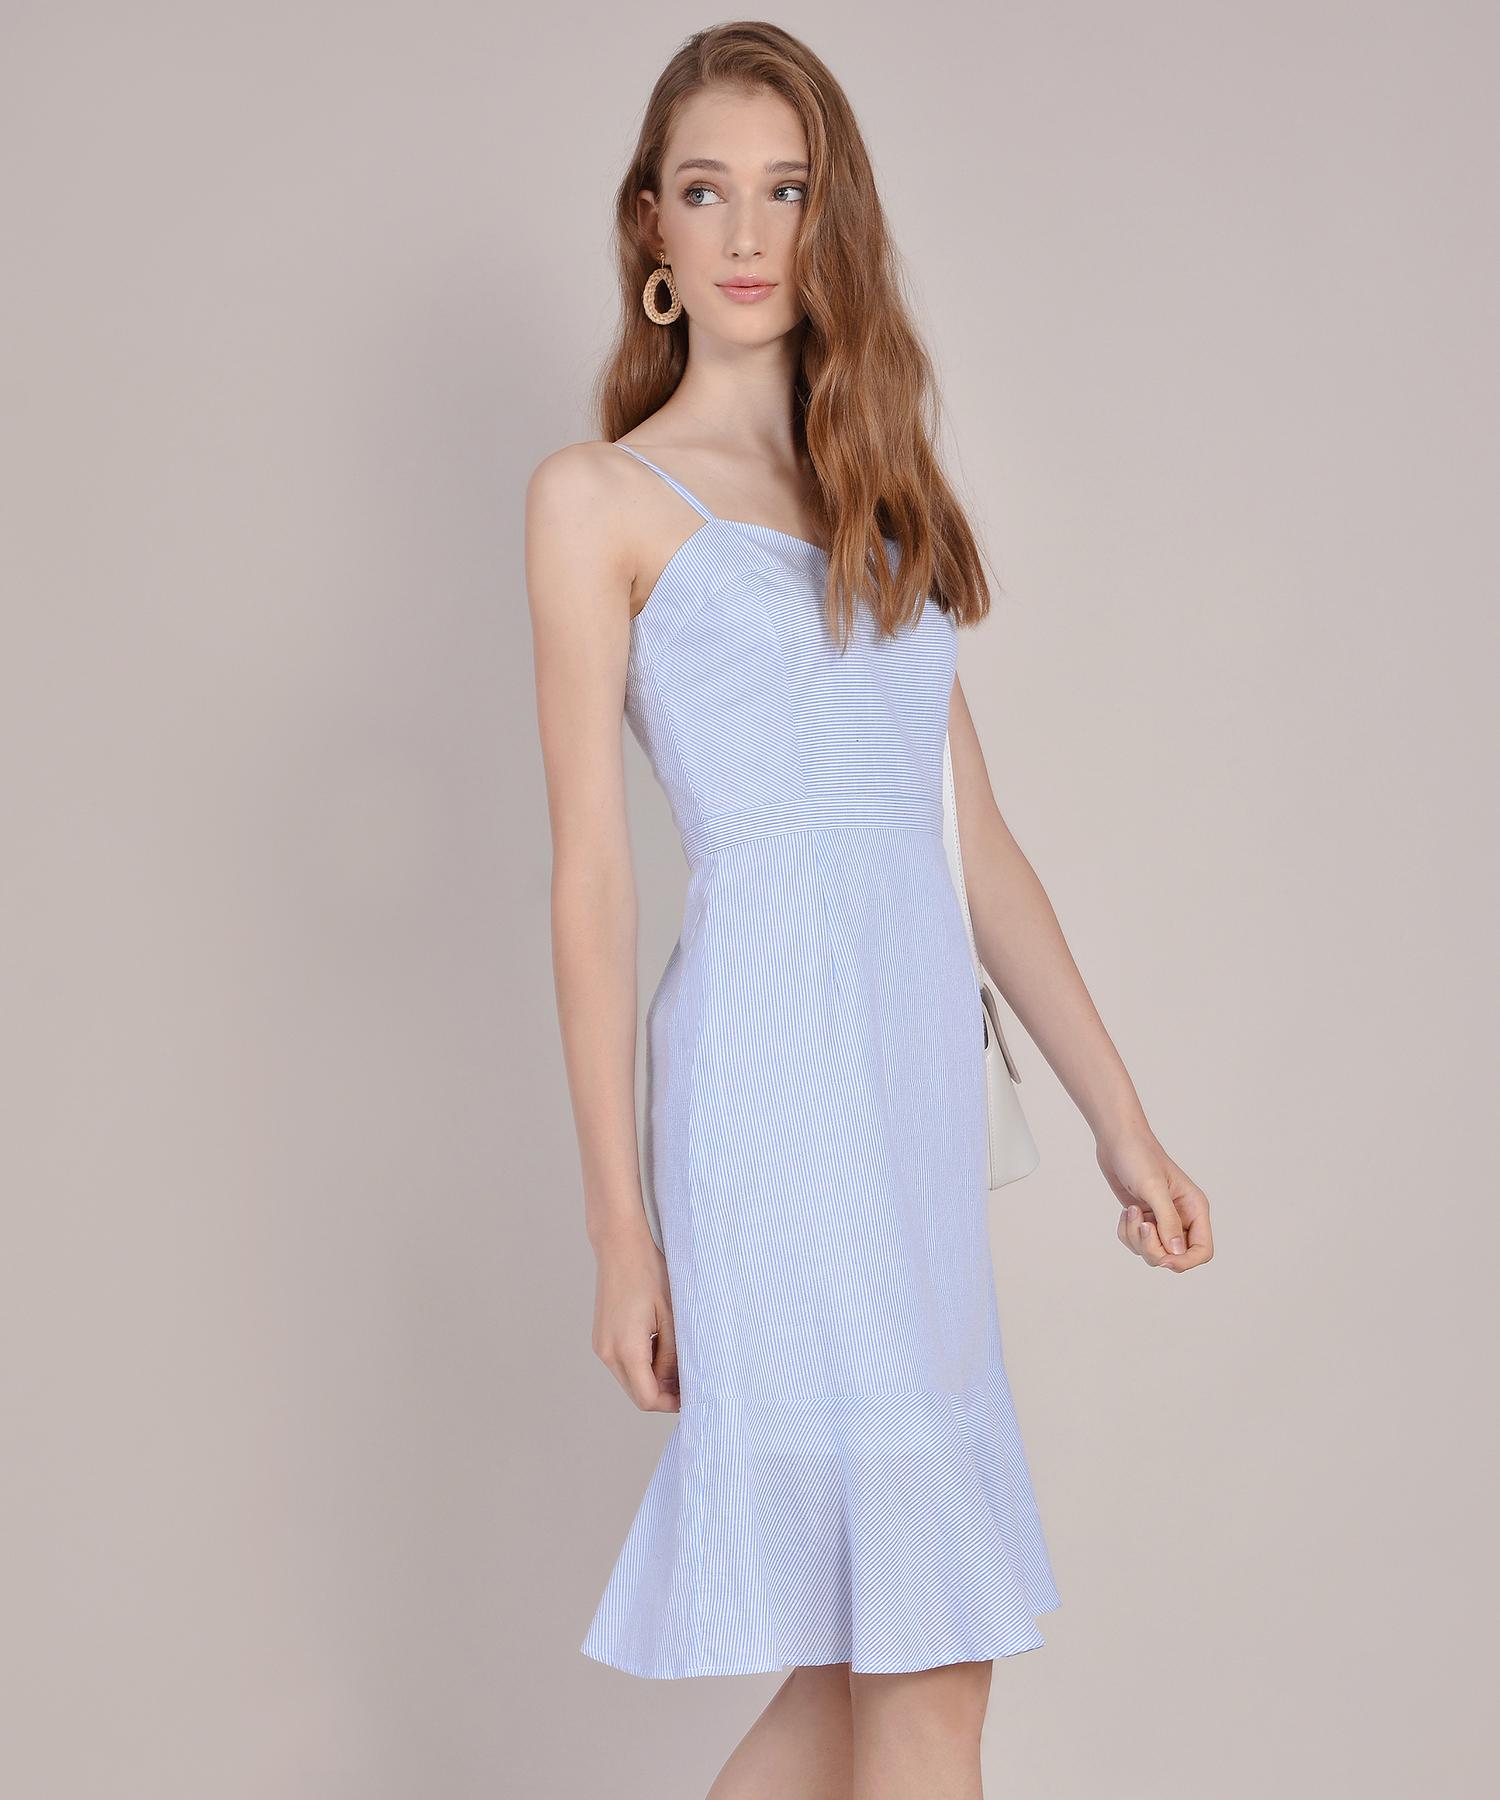 c3effb06873b Avon Striped Midi Dress - Pale Blue | hervelvetvase